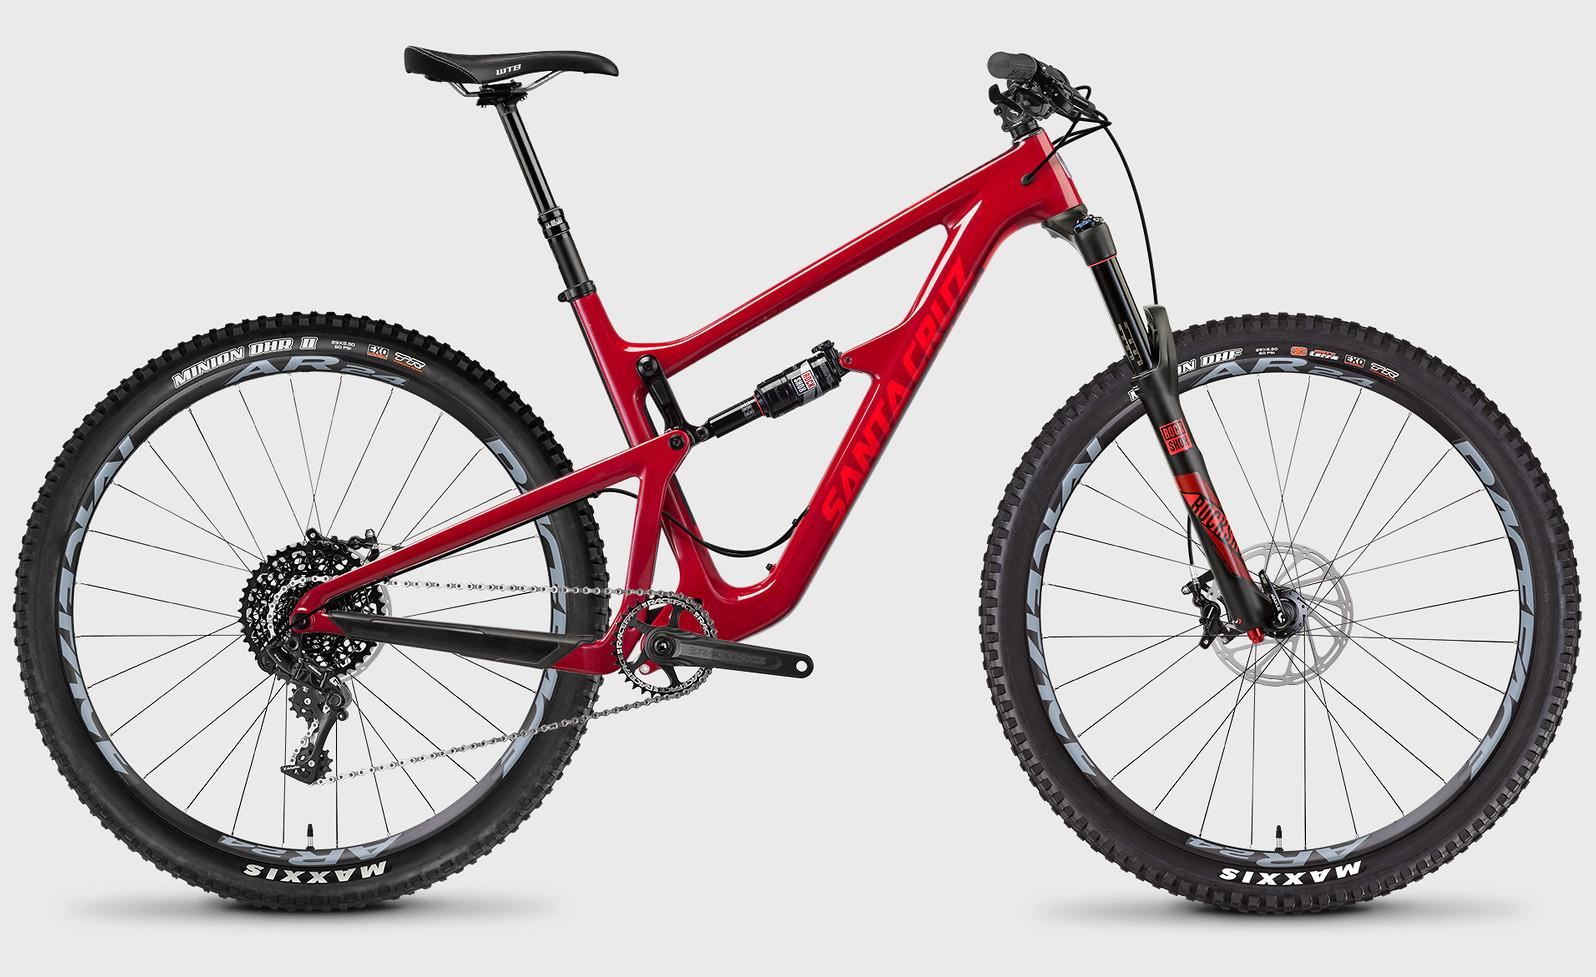 2017 Santa Cruz Hightower Carbon C S  2017 Santa Cruz Hightower C S Bike (Sriracha/Red)